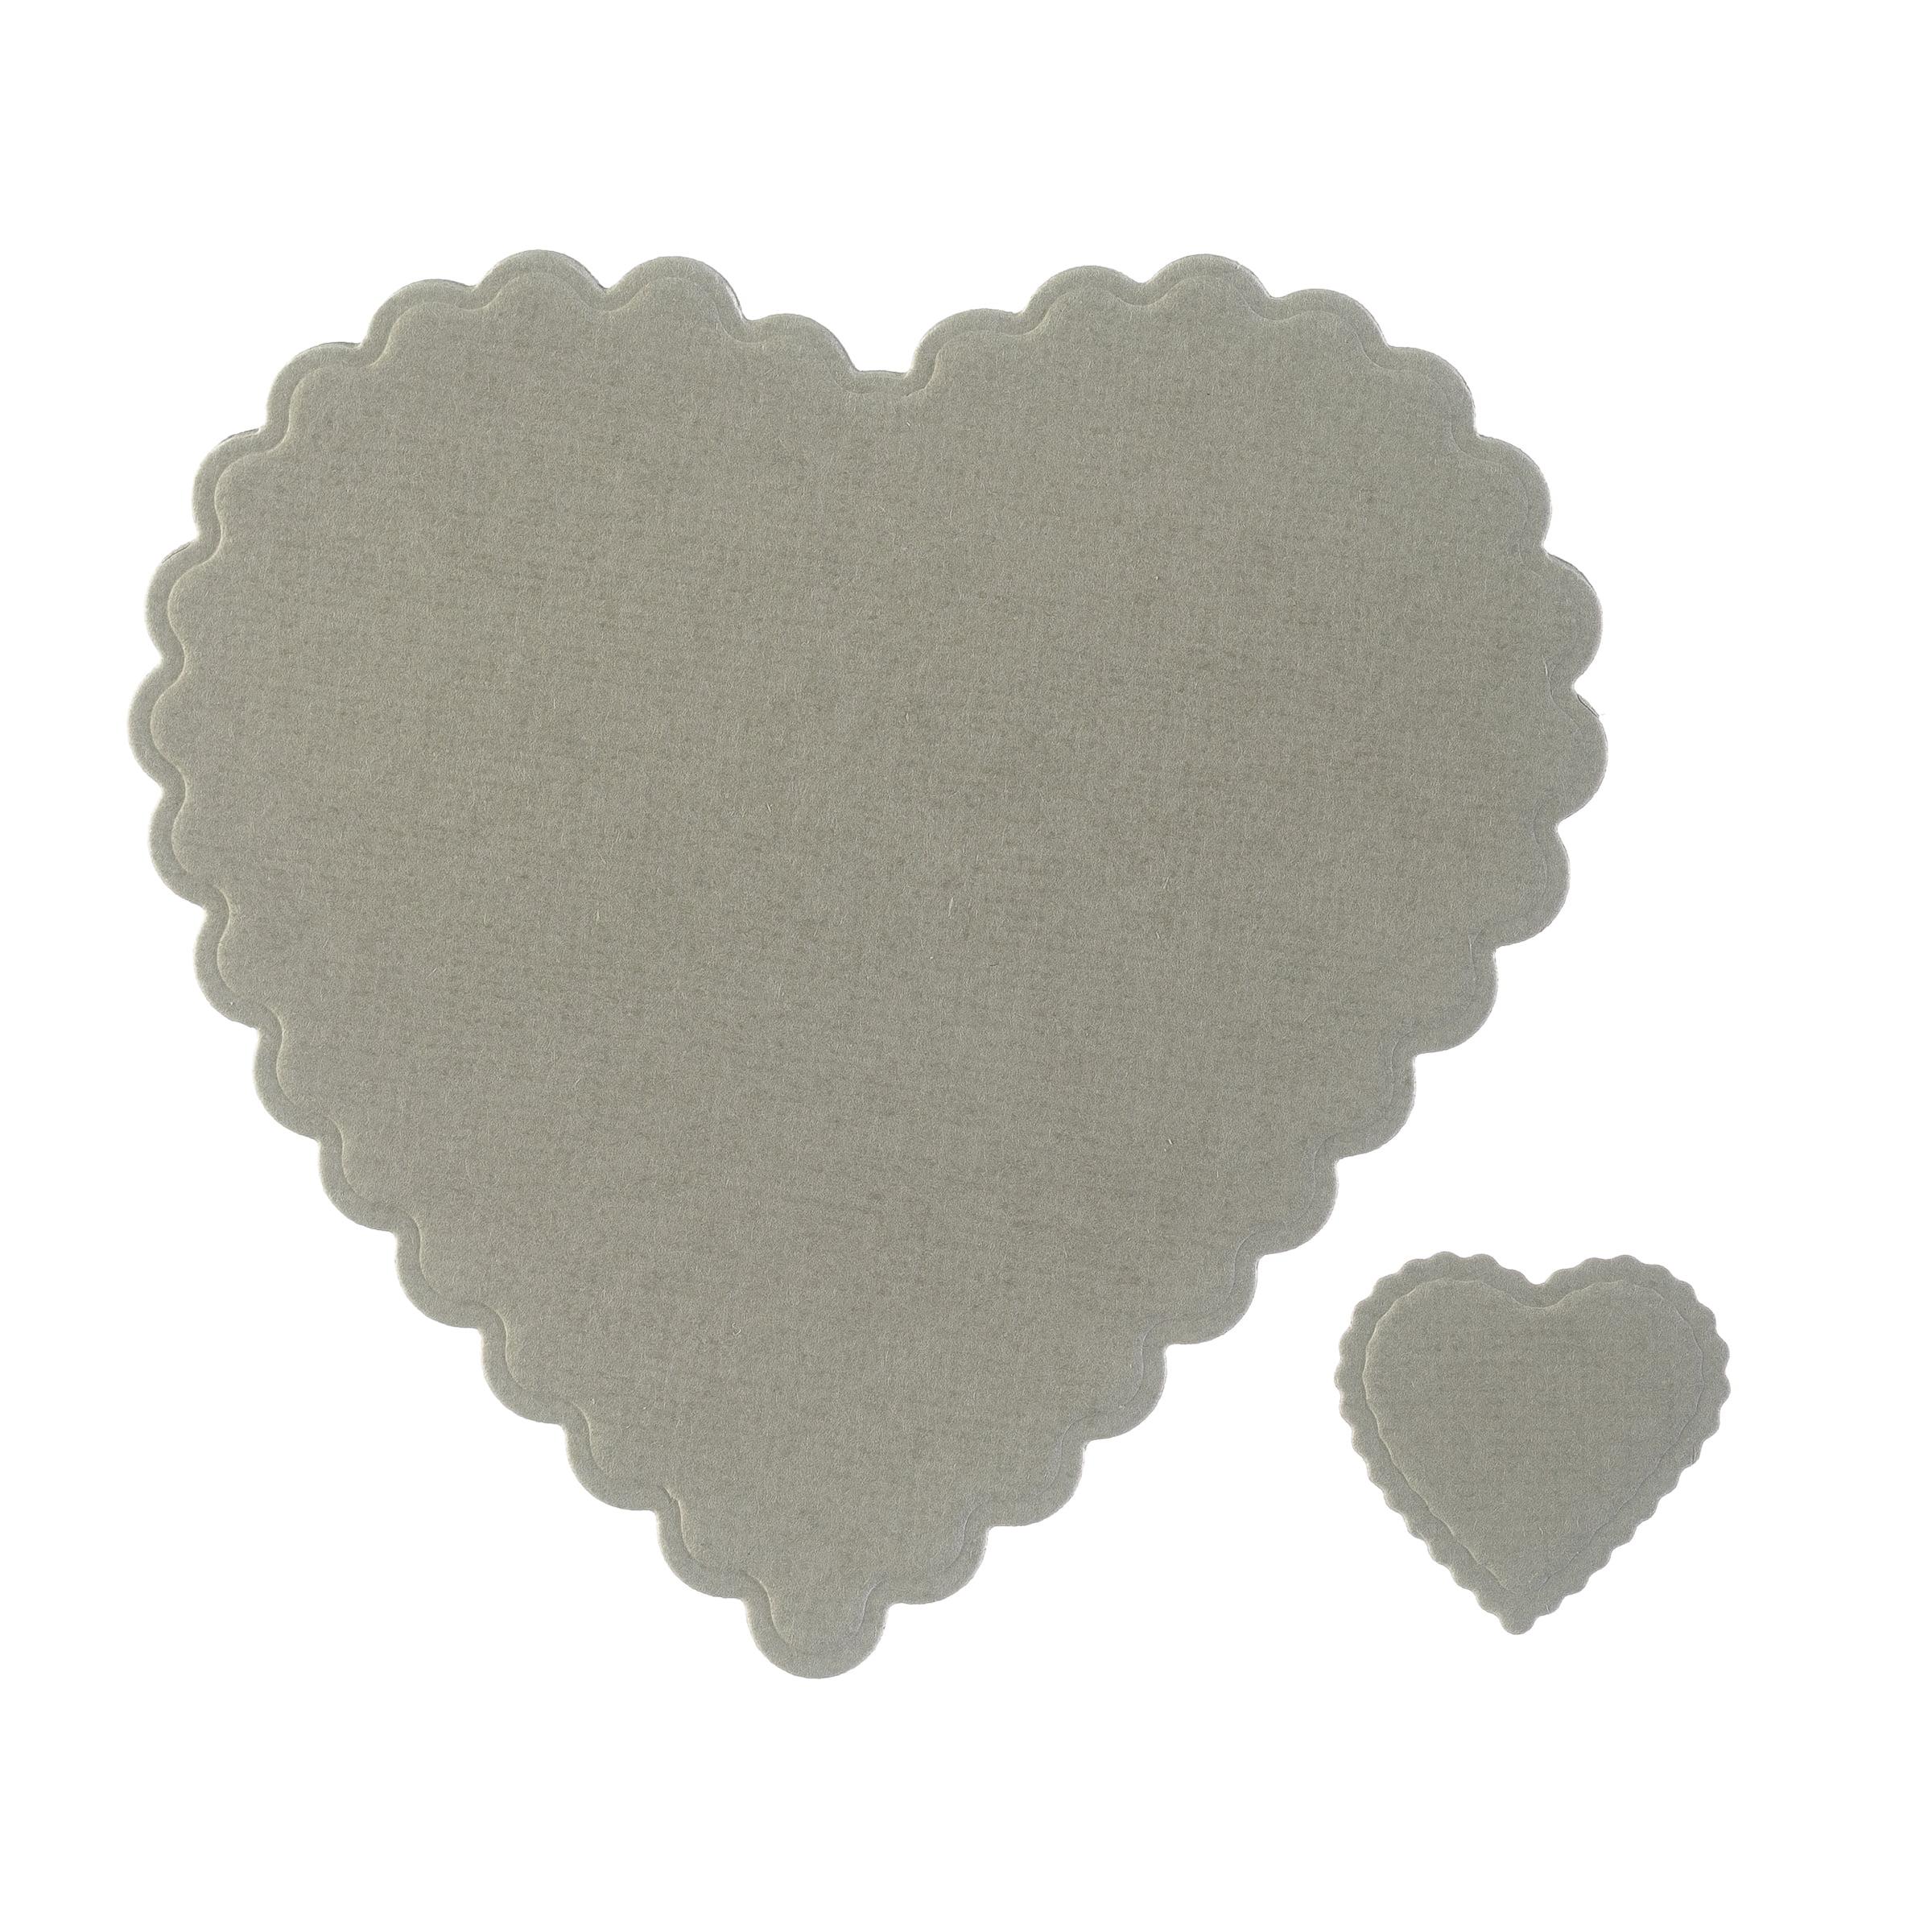 Scalloped Hearts Metal Die Cut Stencil Darice Shapes Craft Cutting Dies 5PC